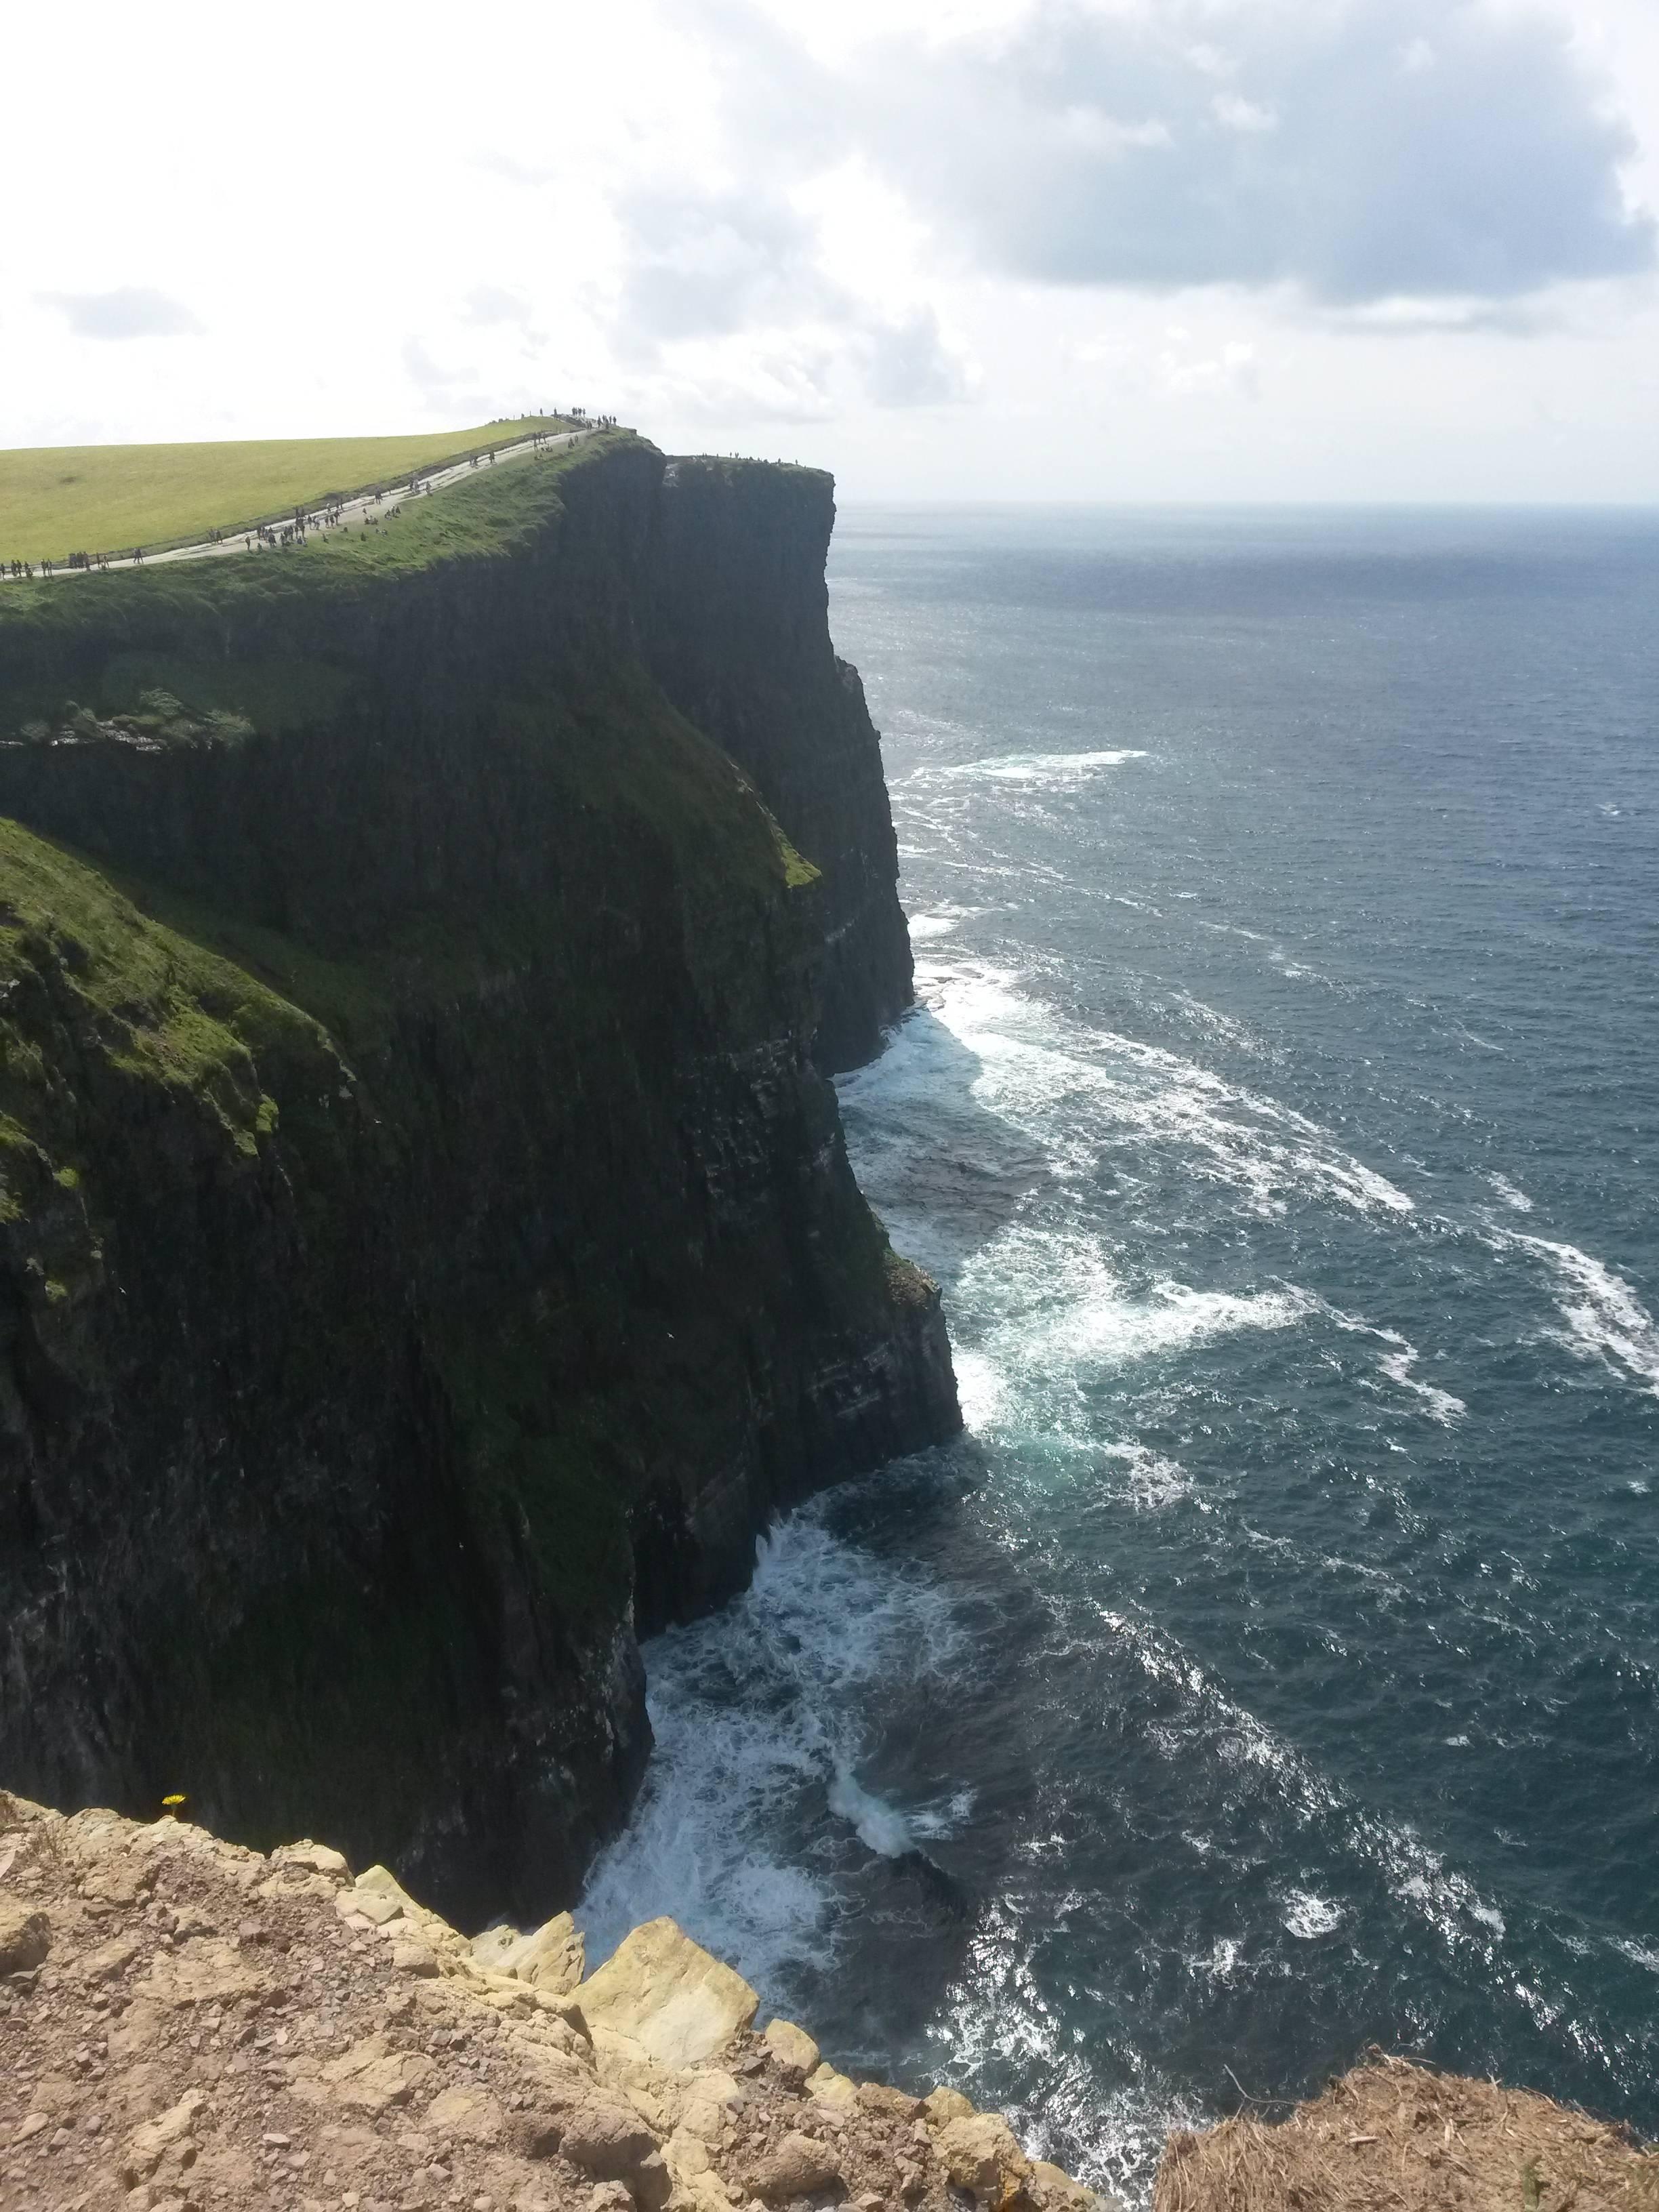 Photo 2: CLIFFS OF MOHER, IRLANDE